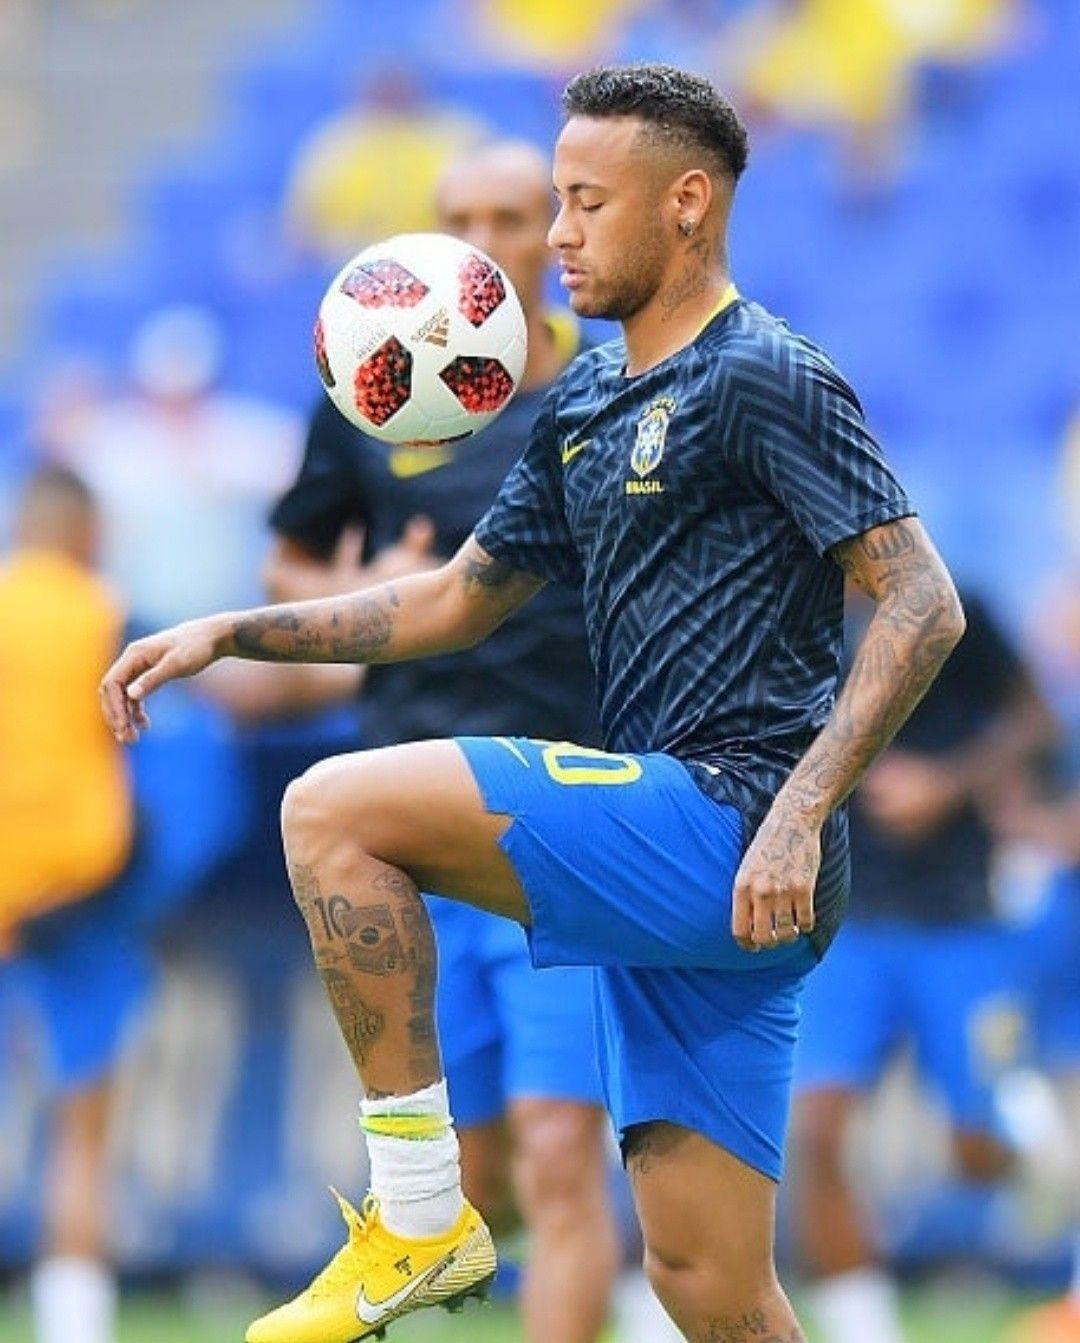 Pin De Ipsita Pataskar Em Neymar Futebol Neymar Jogadores Selecao Brasileira Neymar Brasil